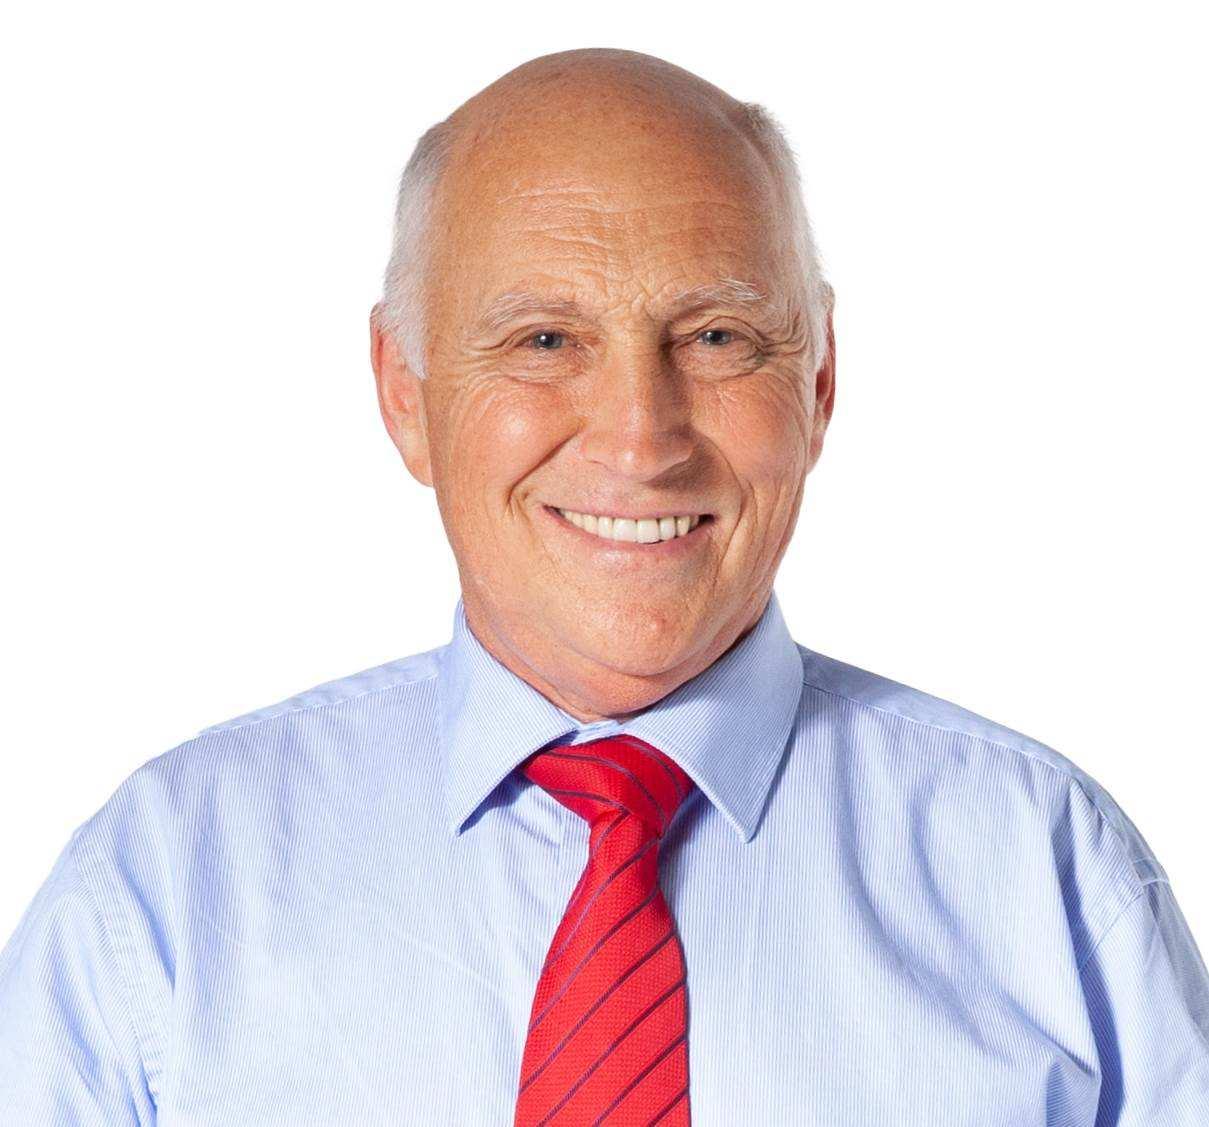 Richard Pearce